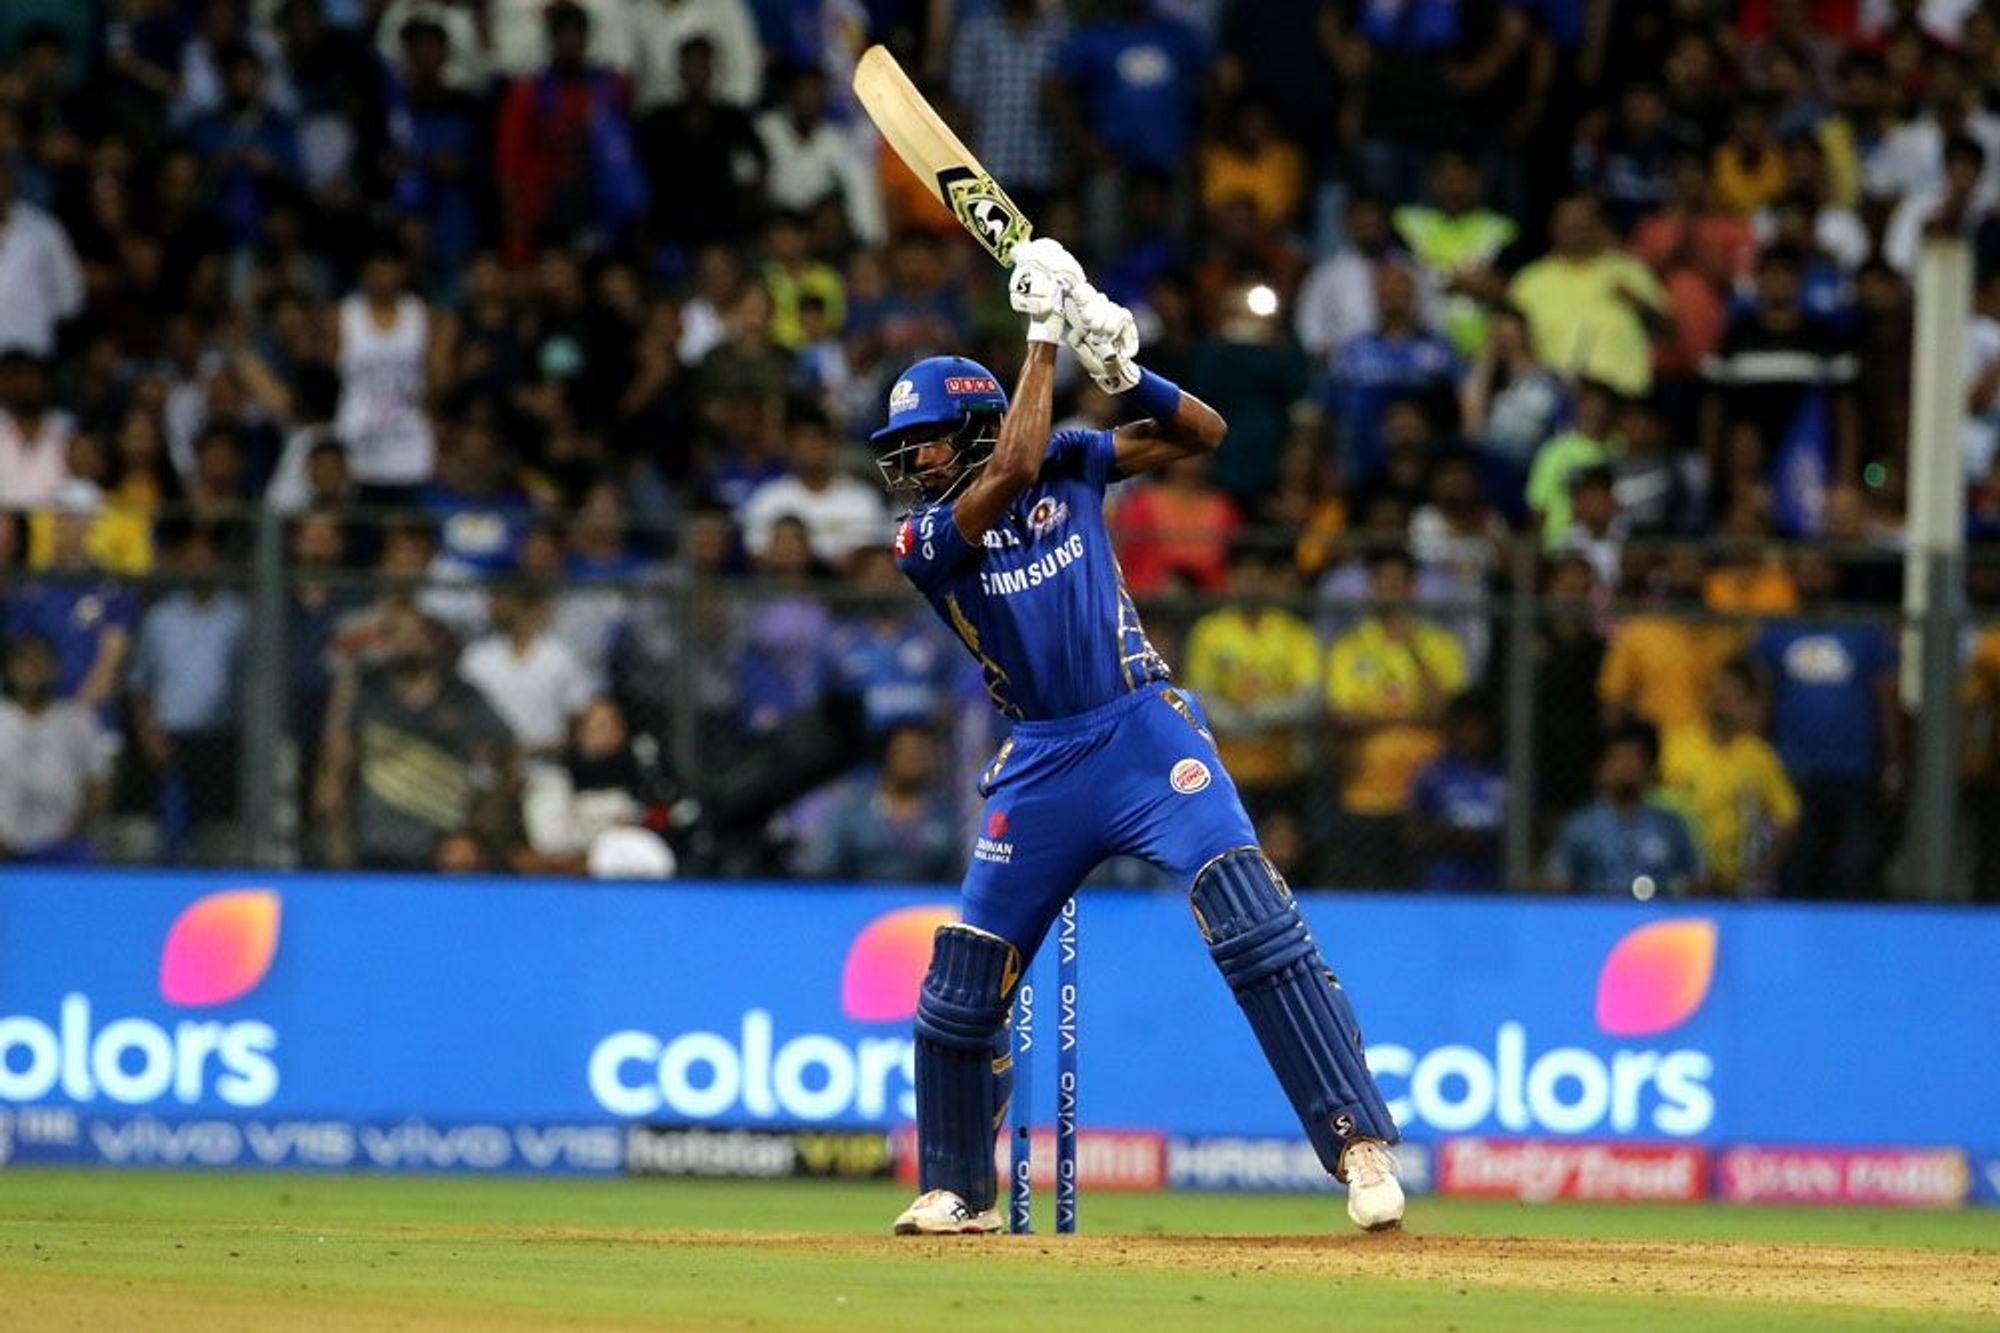 DC vs MI: मुंबई इंडियंस ने बनाए 168 रन ट्विटर पर छाए पांड्या ब्रदर्स